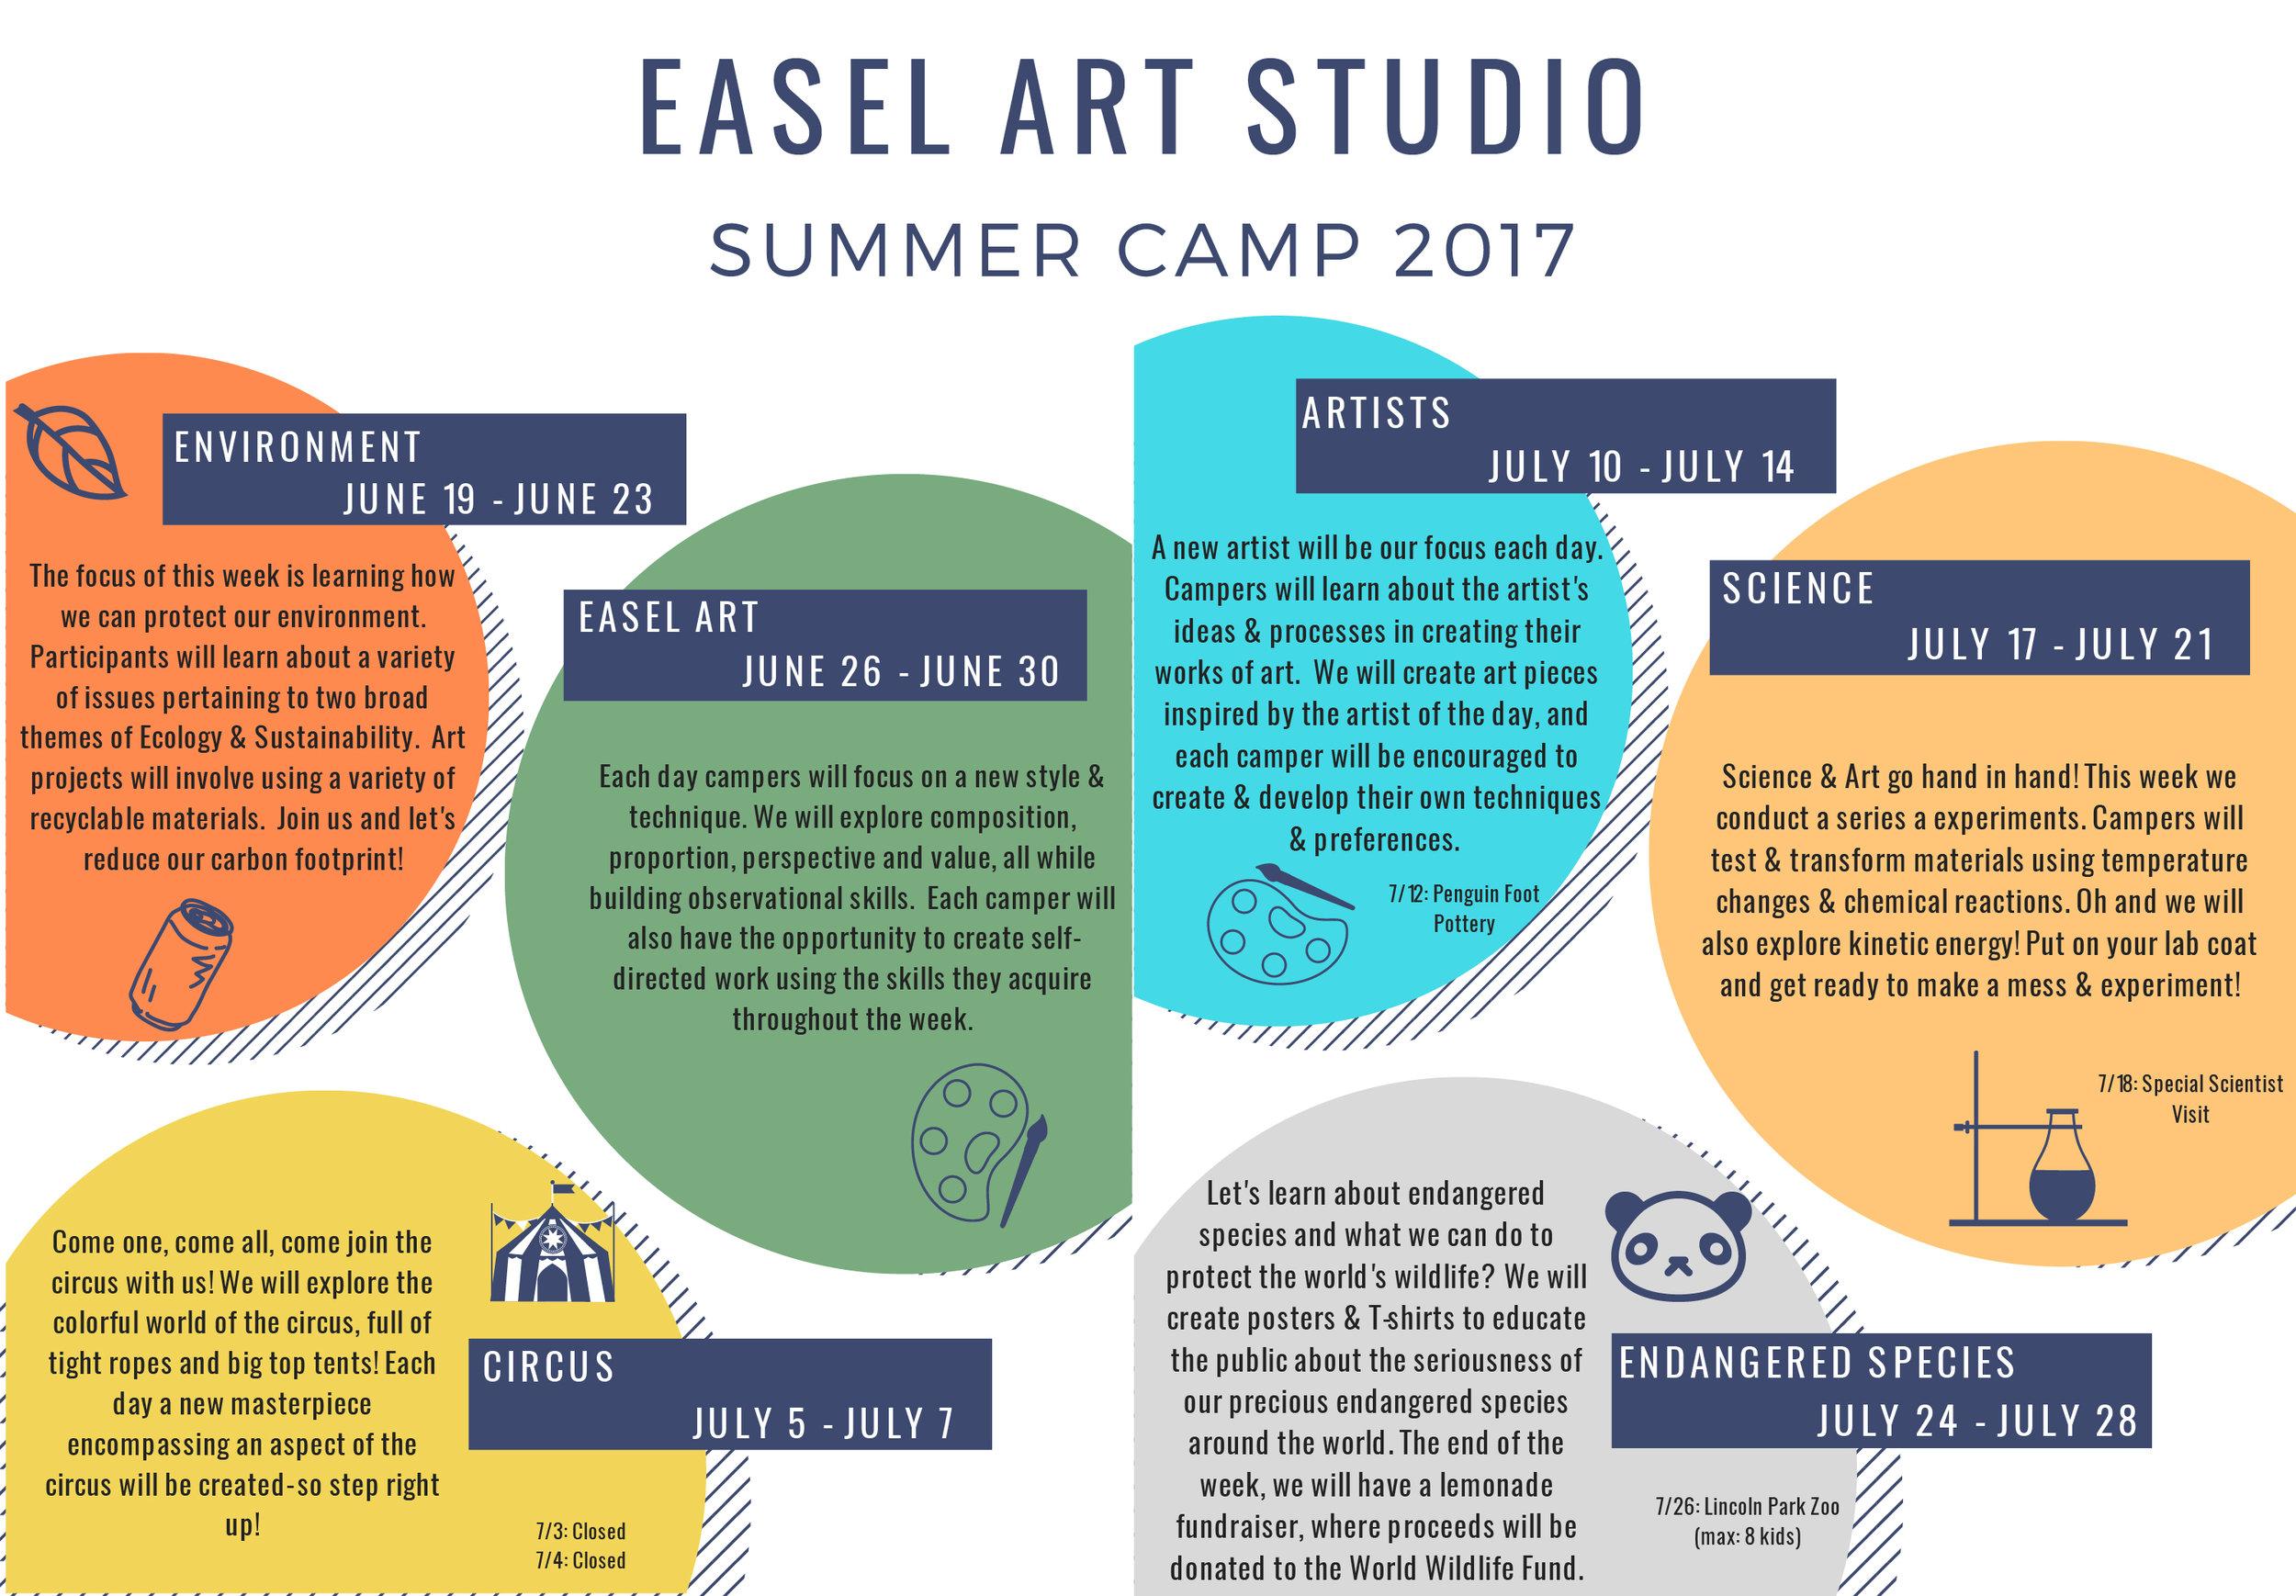 EAS-SummerCamp-web-01.jpg